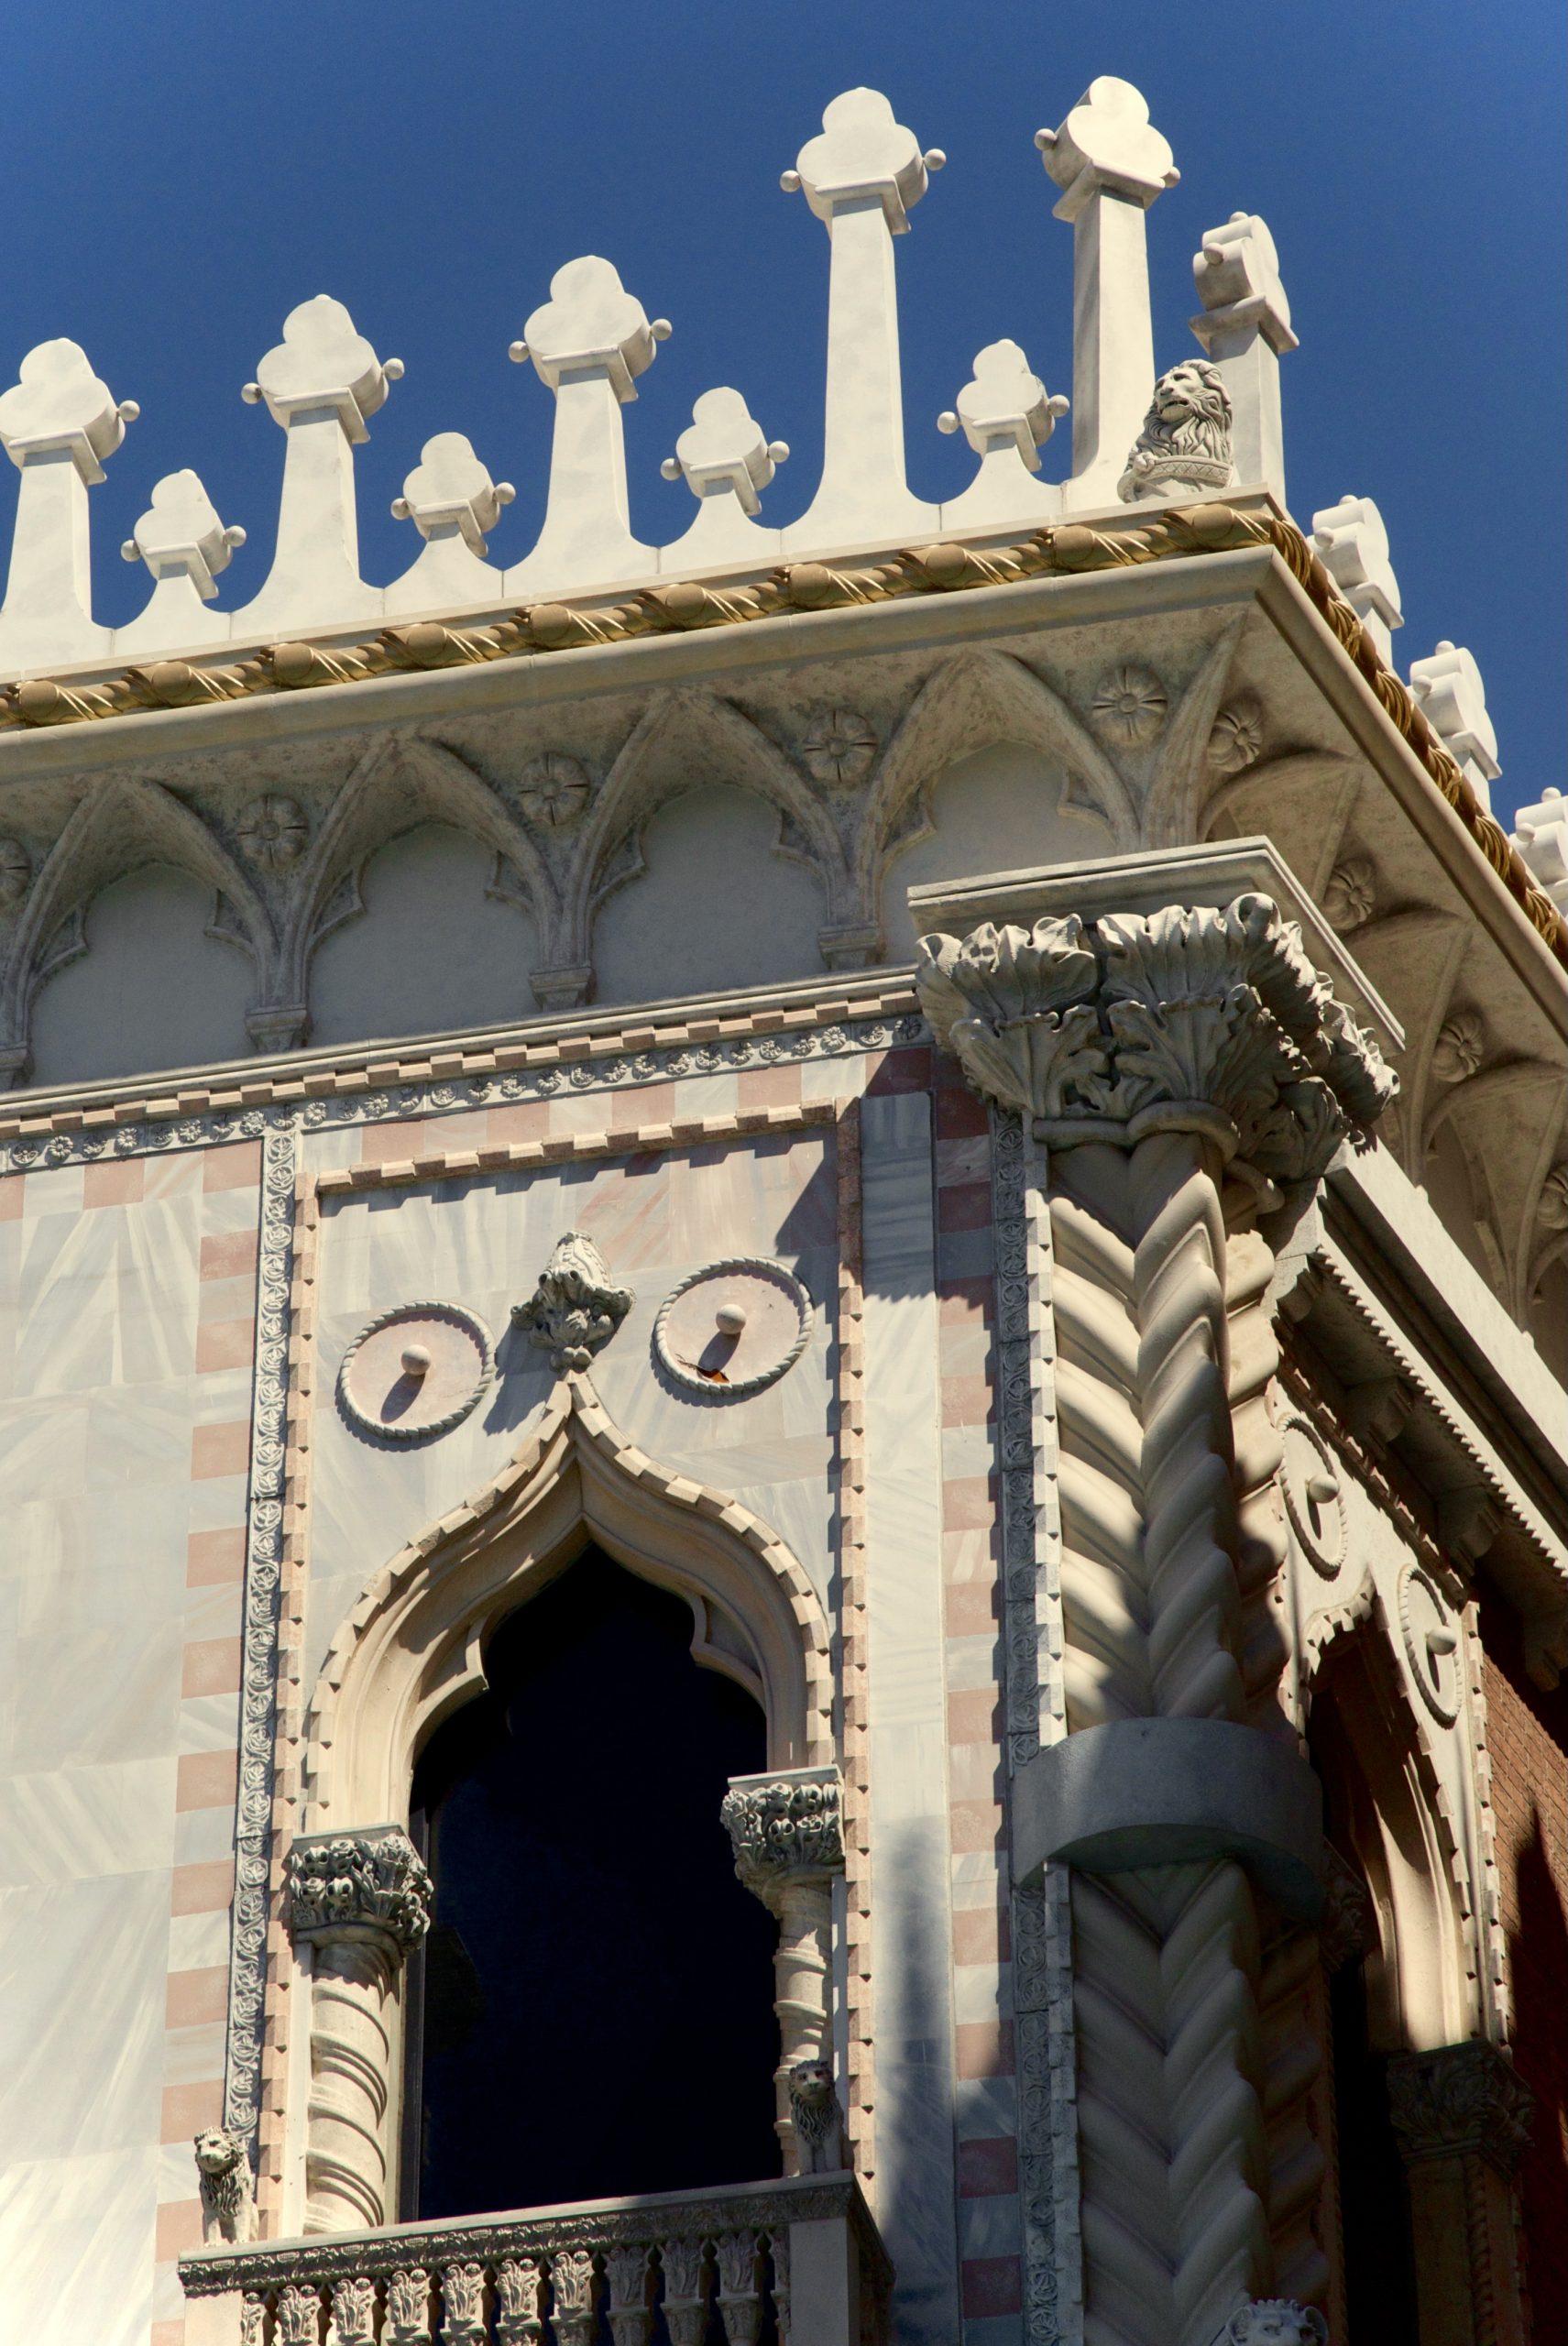 Sands Venetian Artwork